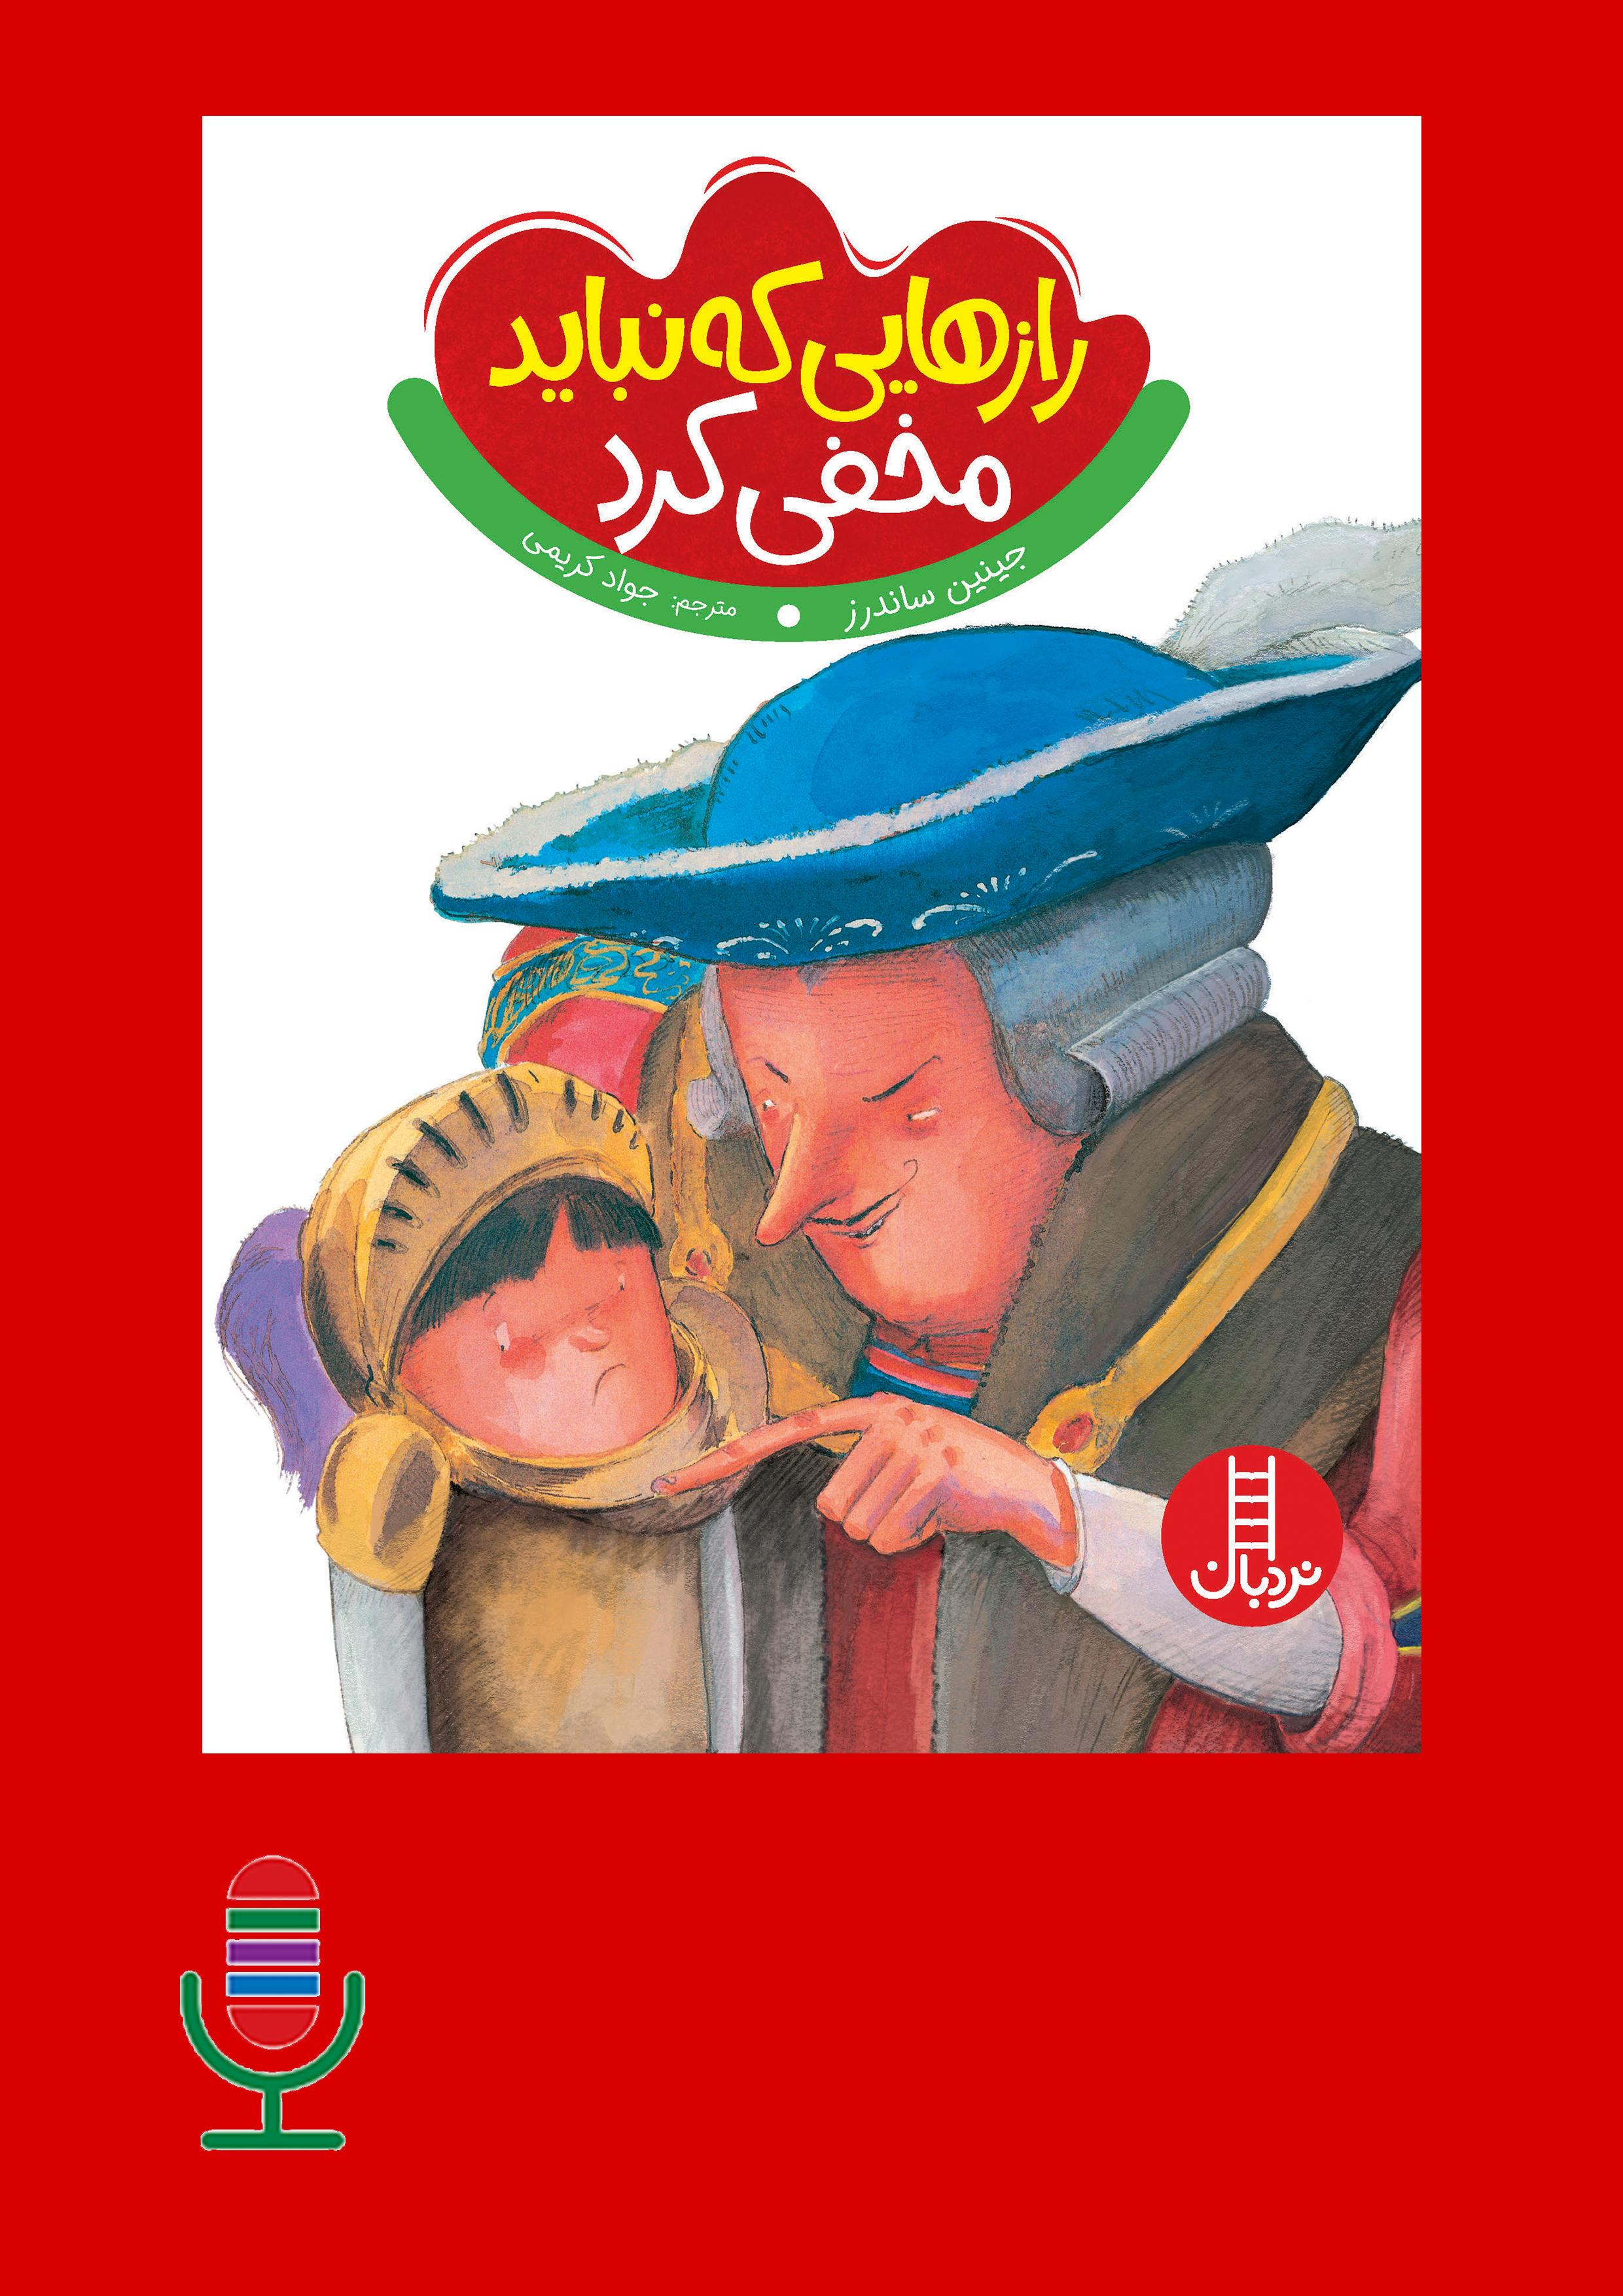 Razhaii Ke Nabayad Makhfi Kard